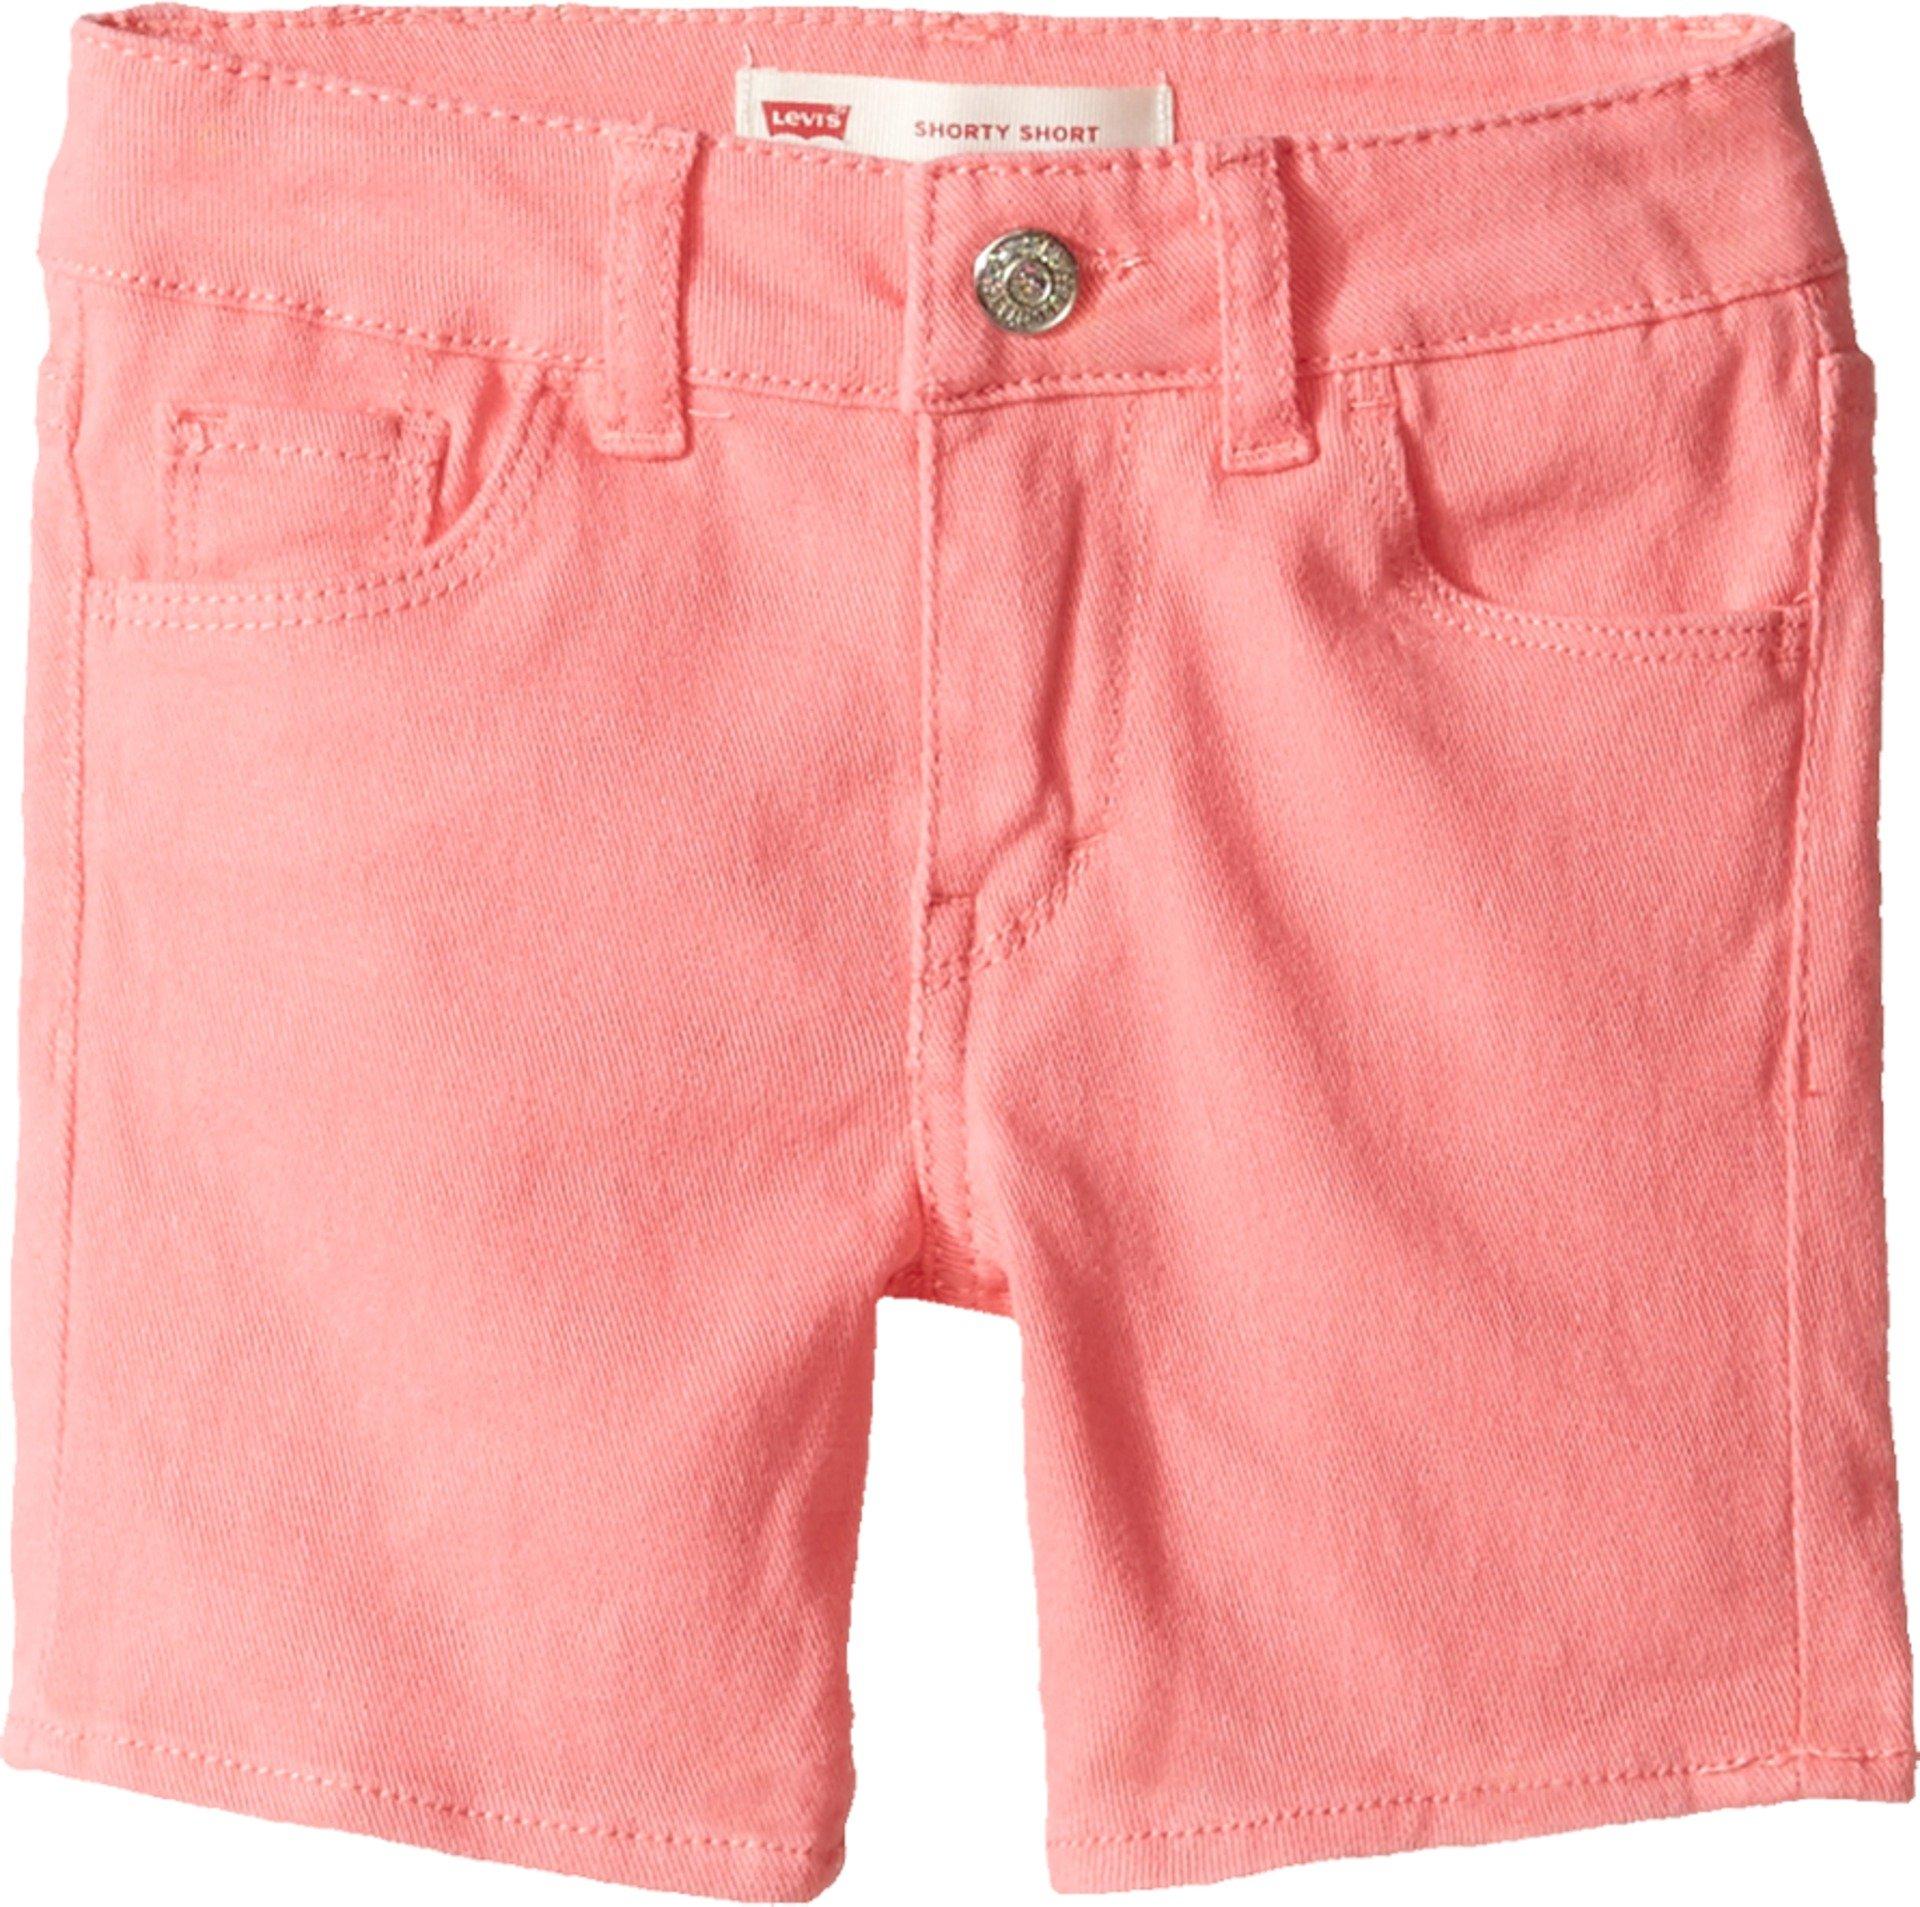 Levi's Kids Baby Girl's Summer Love Midi Short (Toddler) Strawberry Pink Shorts